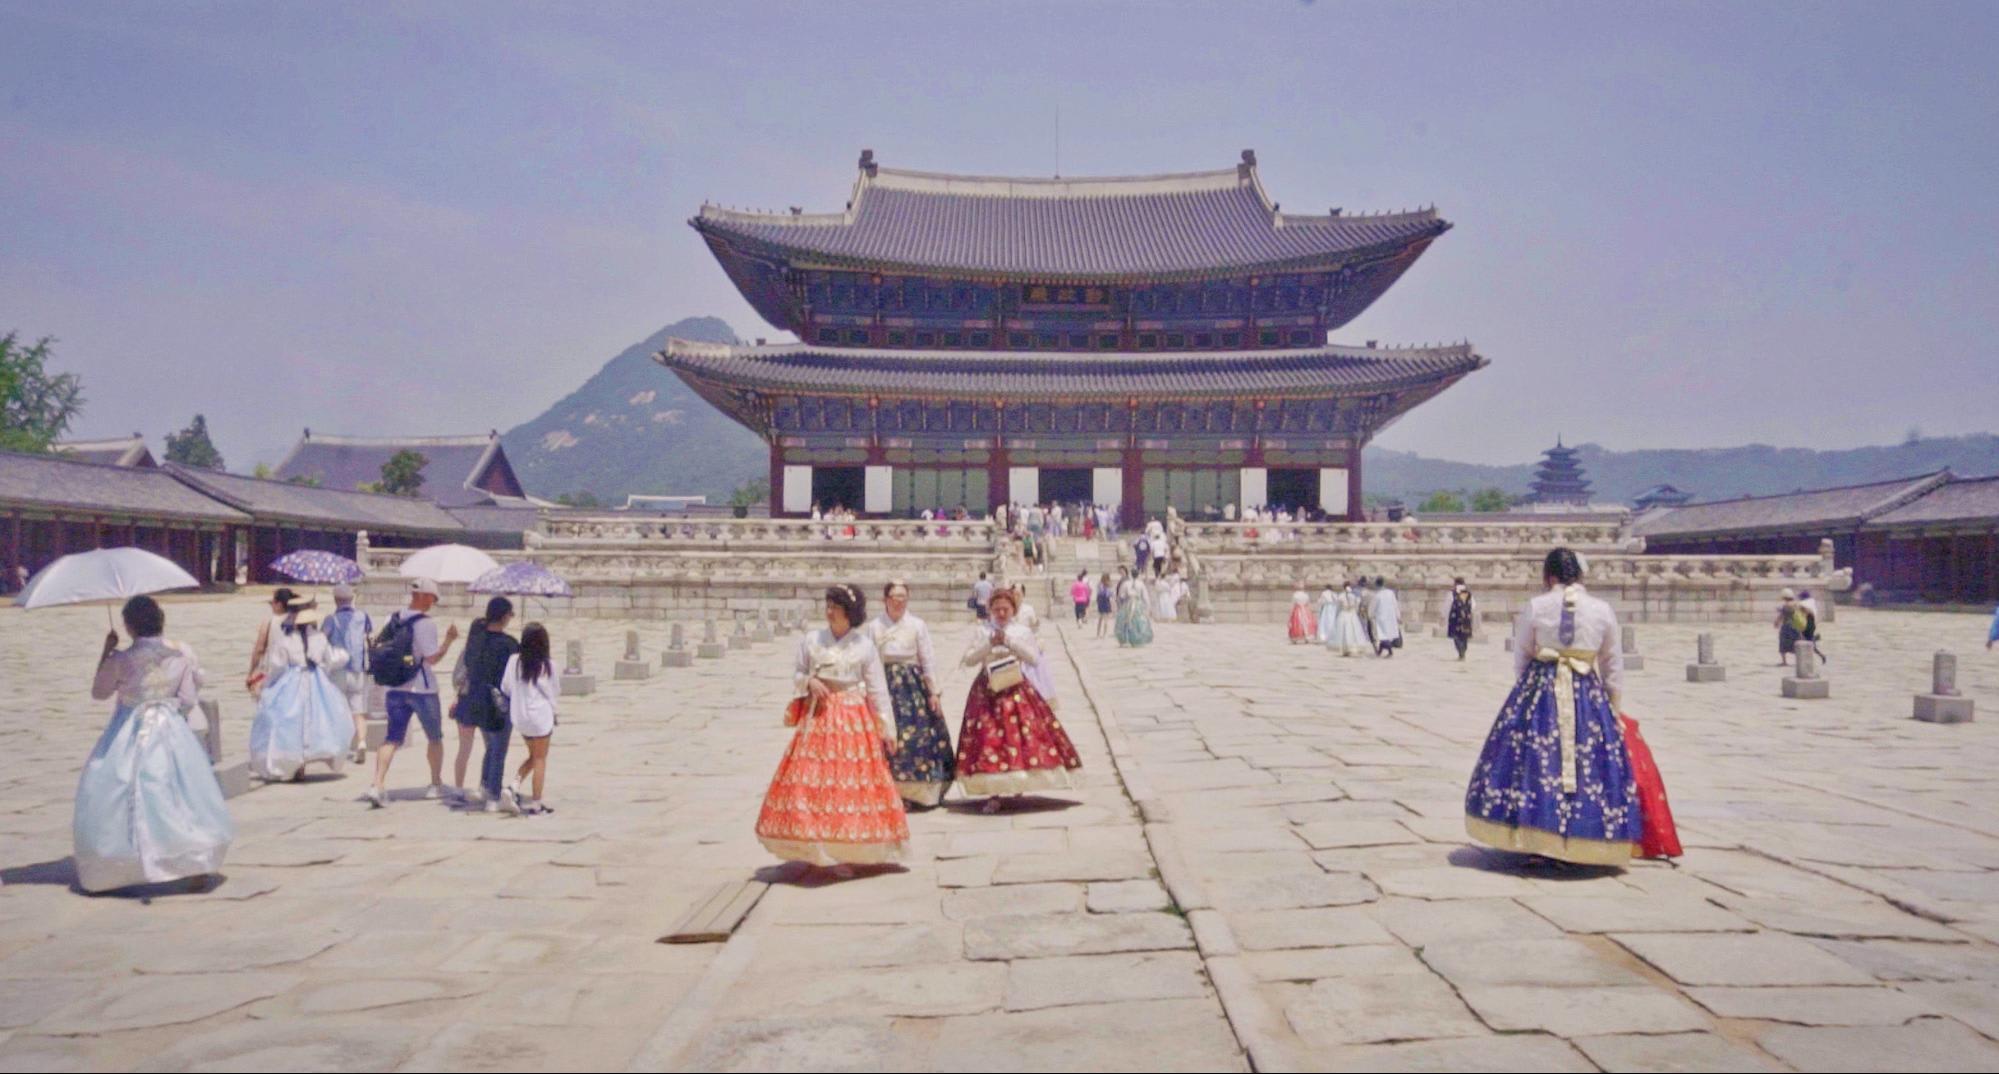 BILLY COLEEN SEOUL SOUTH KOREA GYEONGBOKGUNG PALACE